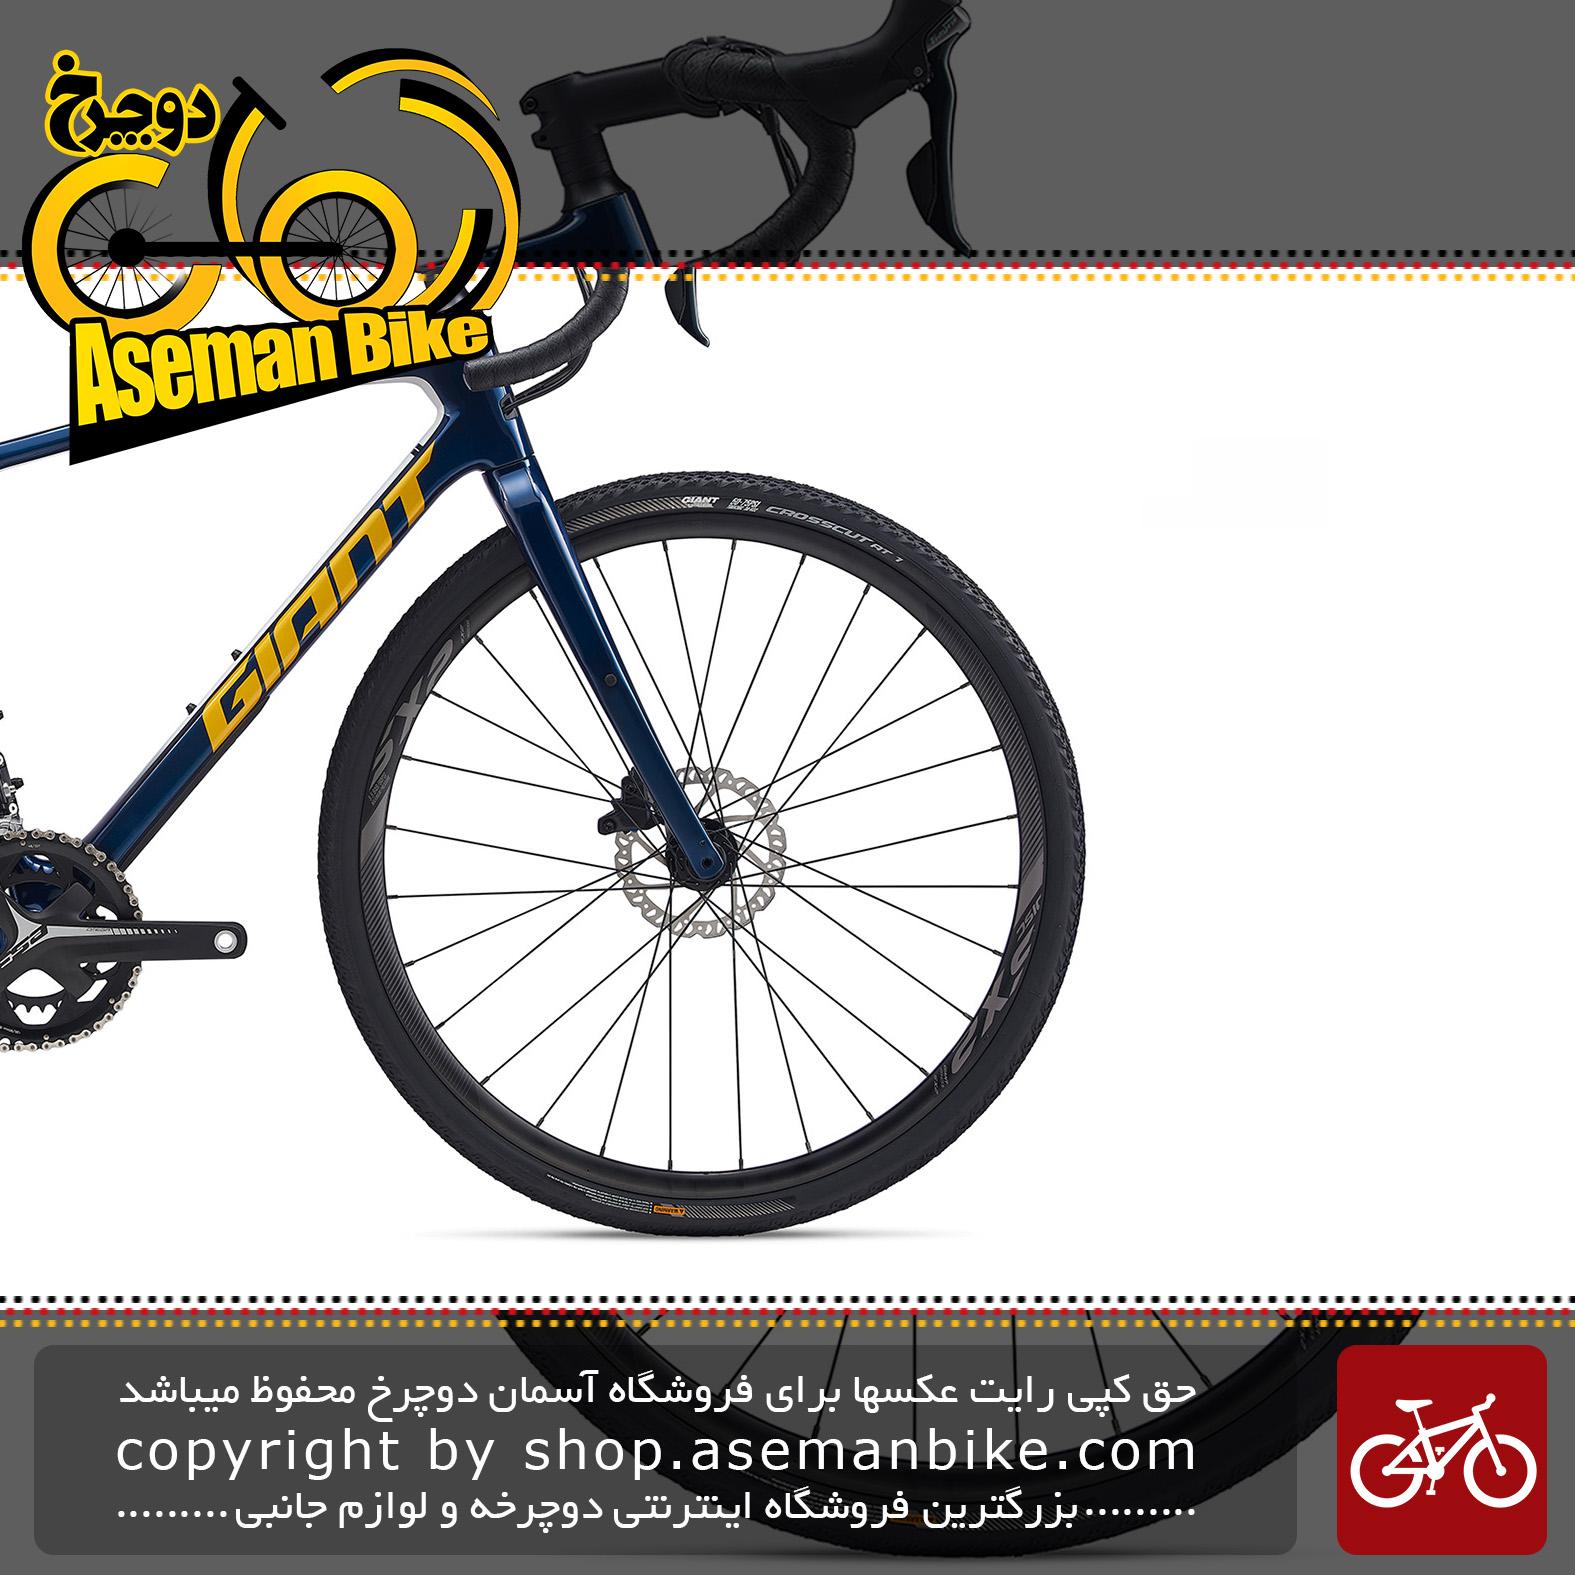 دوچرخه دومنظوره جاینت مدل ریولت ادونس 3 2020 Giant Gravel Bicycle Revolt Advanced 3 2020